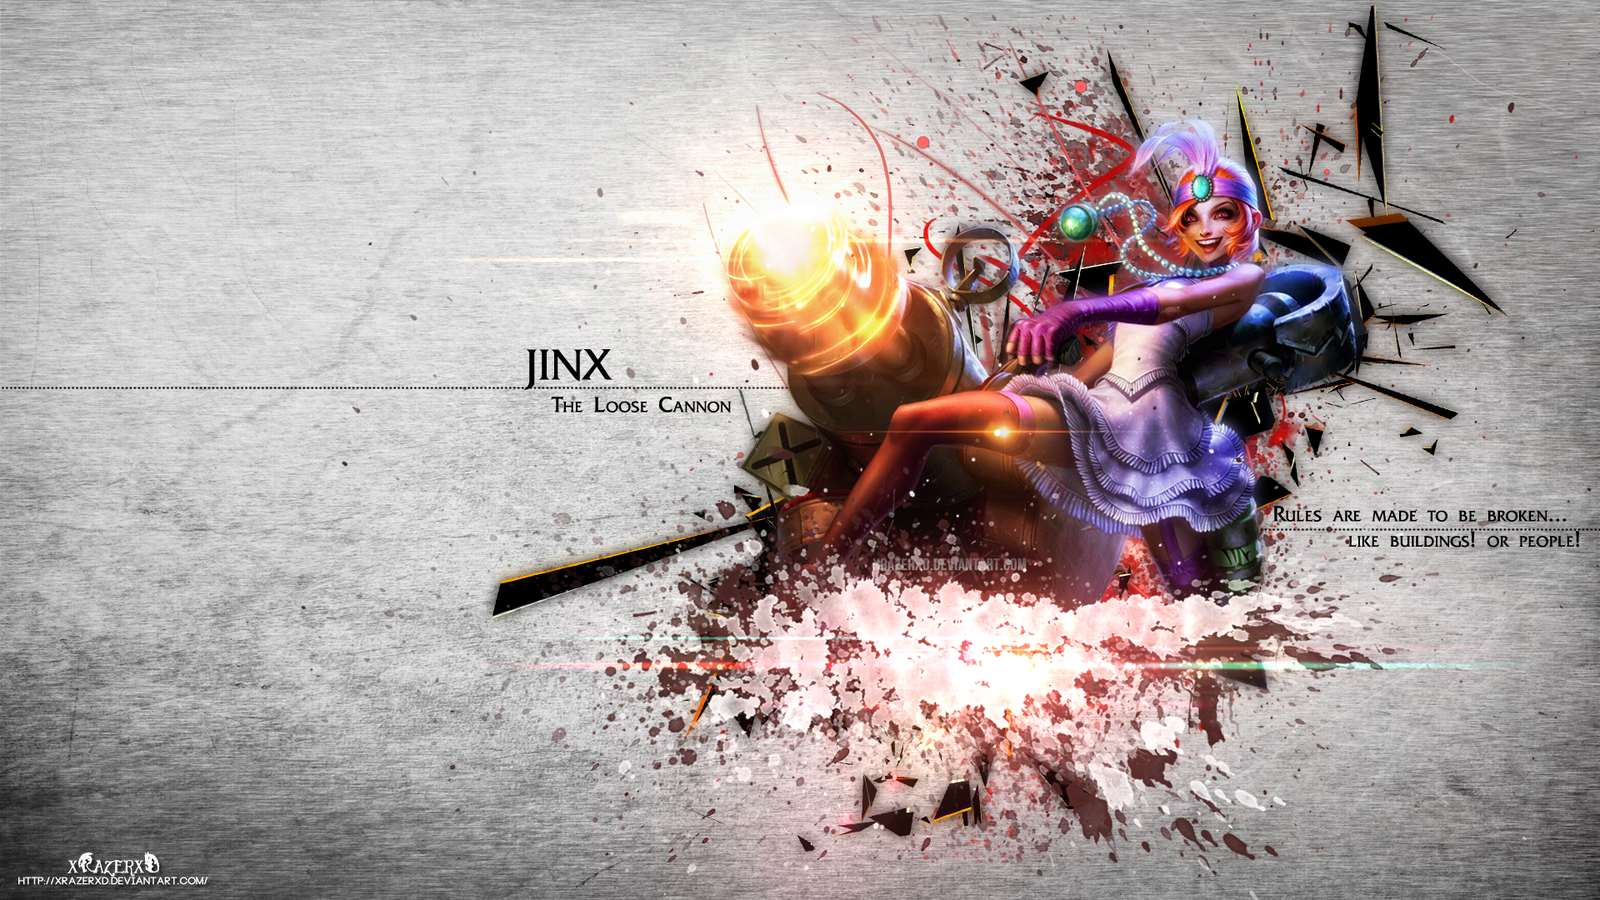 Mafia Jinx Wallpaper HD By XRazerxD On DeviantArt